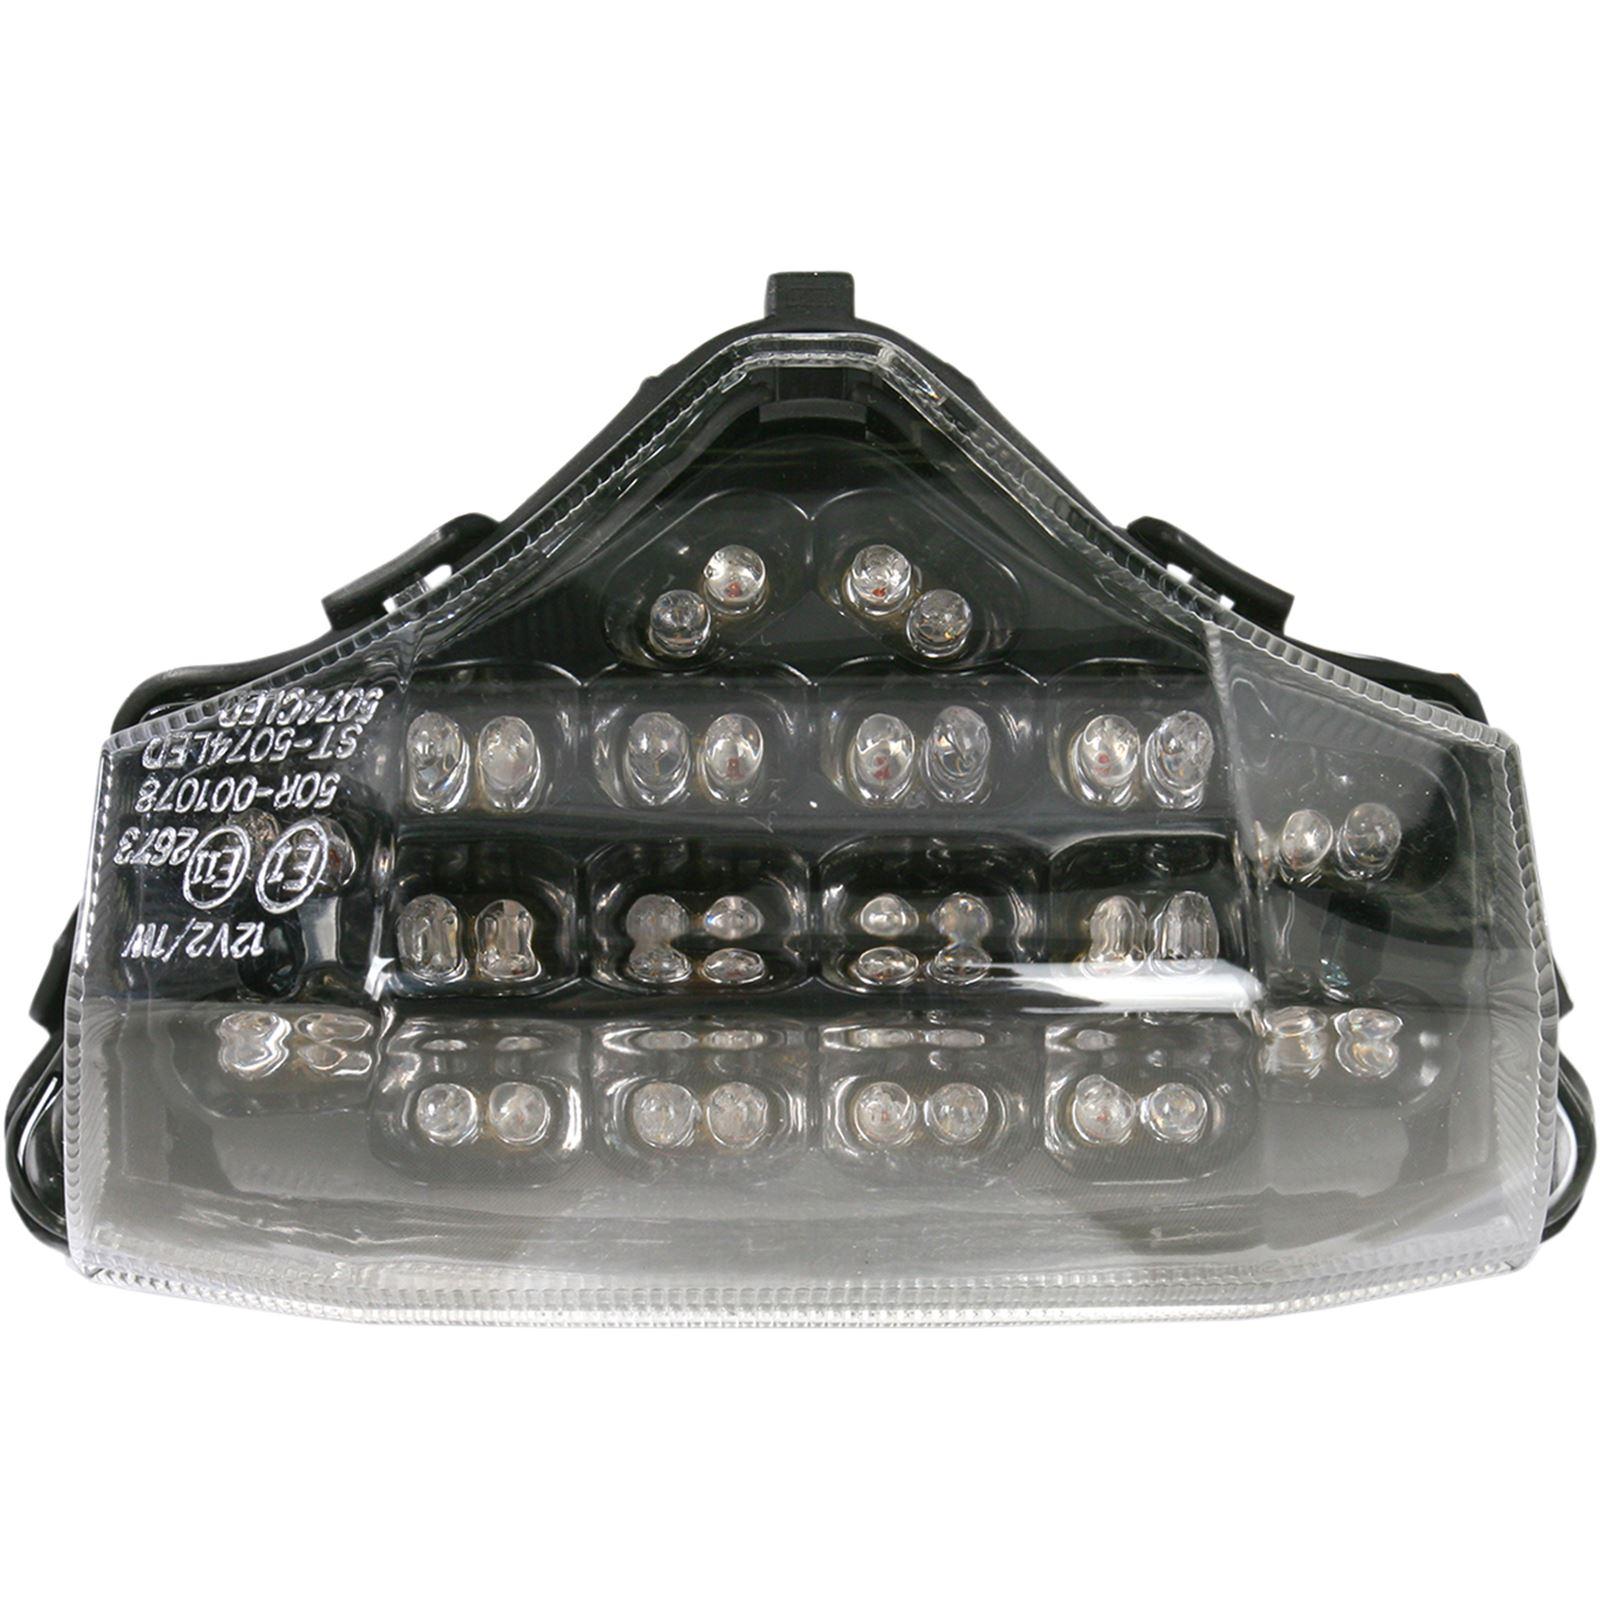 Moto Mph Taillight -  FZ6 - Shadow